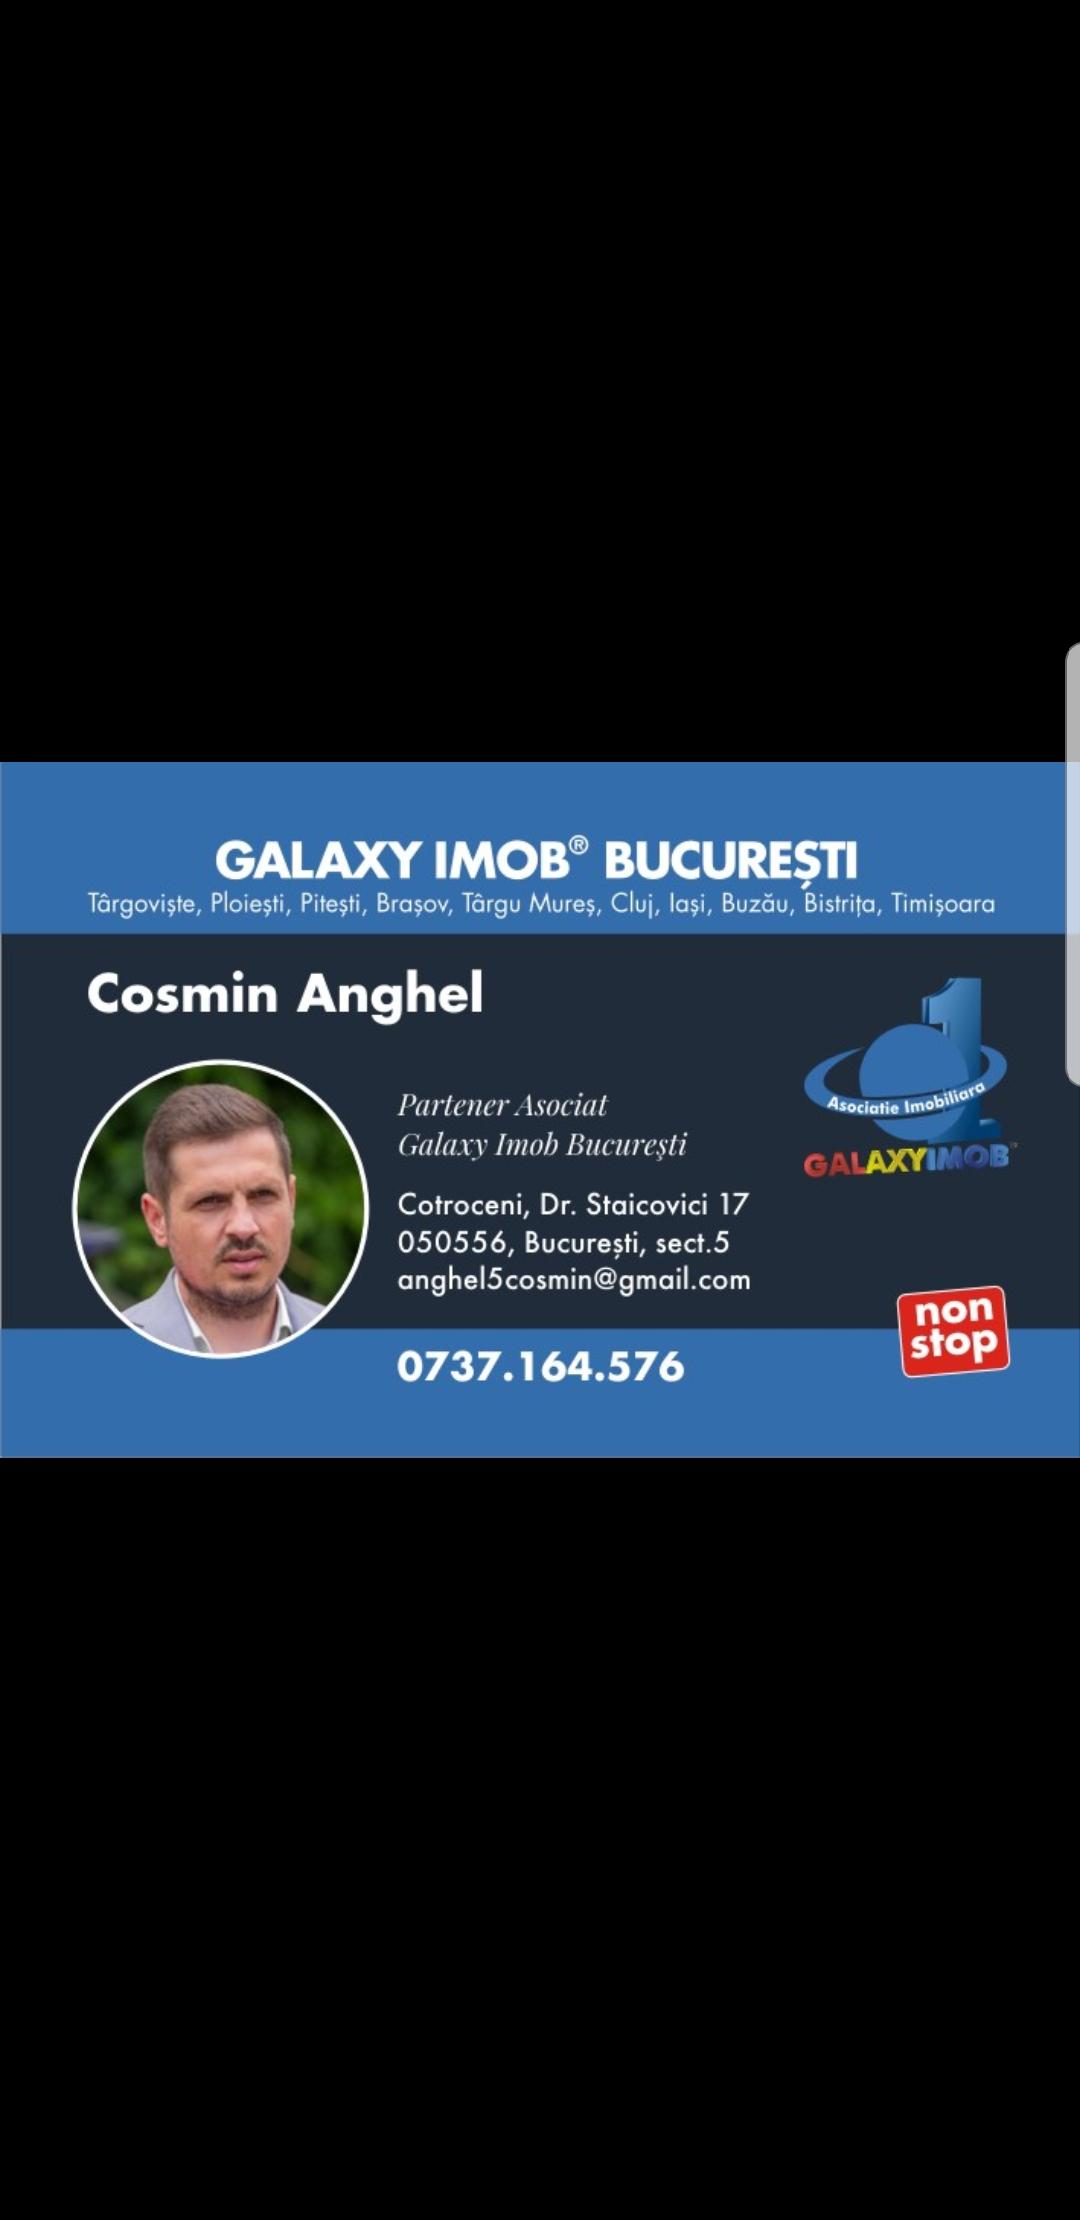 GLX2315B.Cosmin Anghel